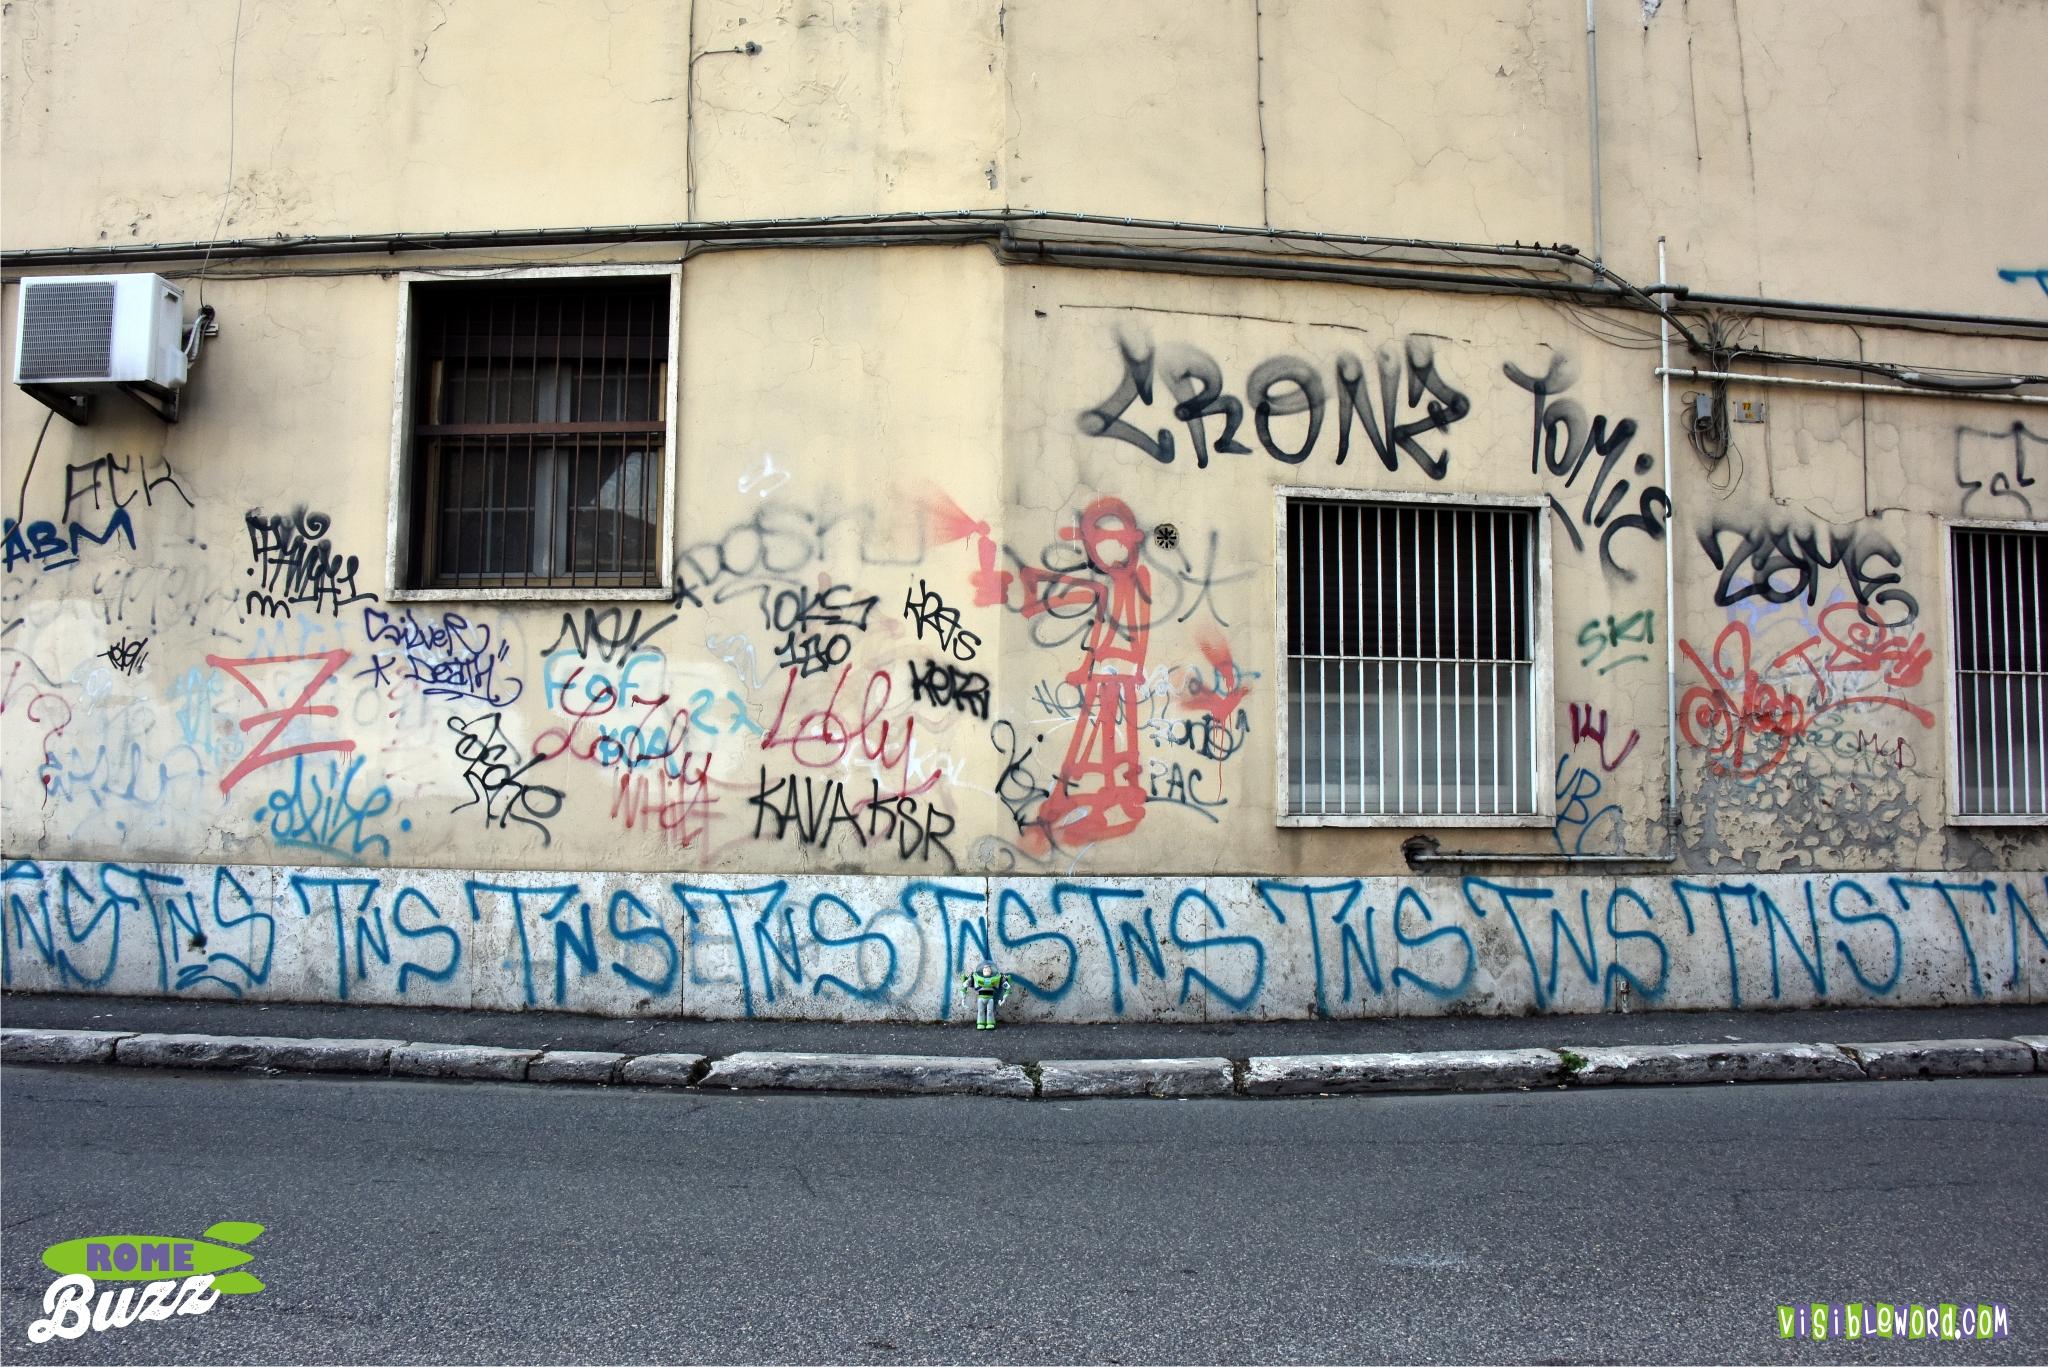 Rome buzz graffiti is an italian word photograph copyright david bailey not the